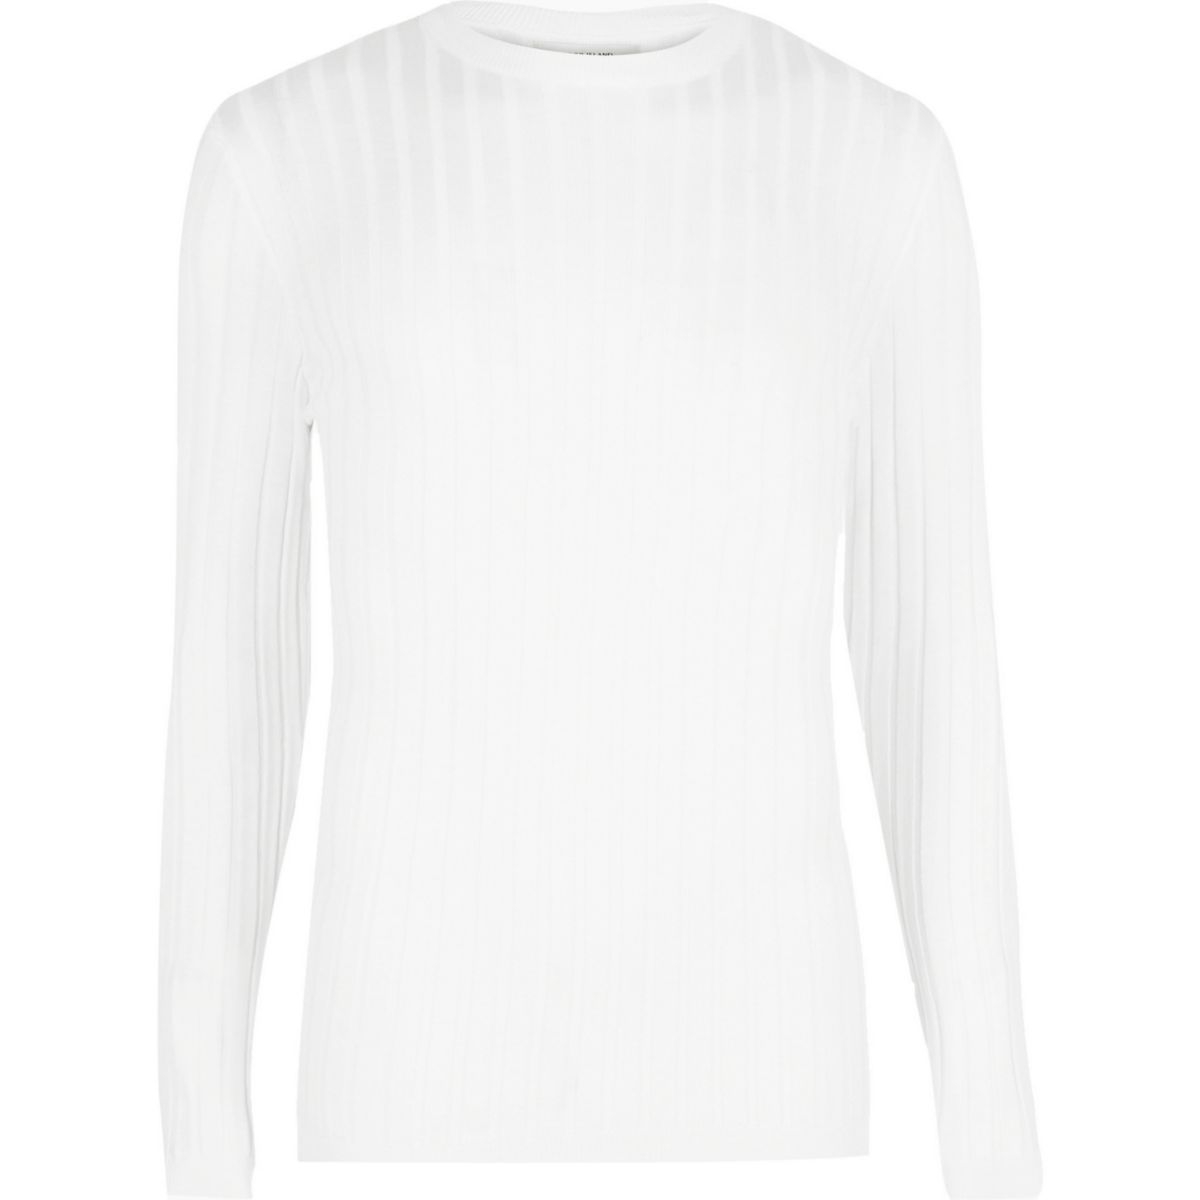 Big and Tall - Witte geribbelde pullover met ronde hals